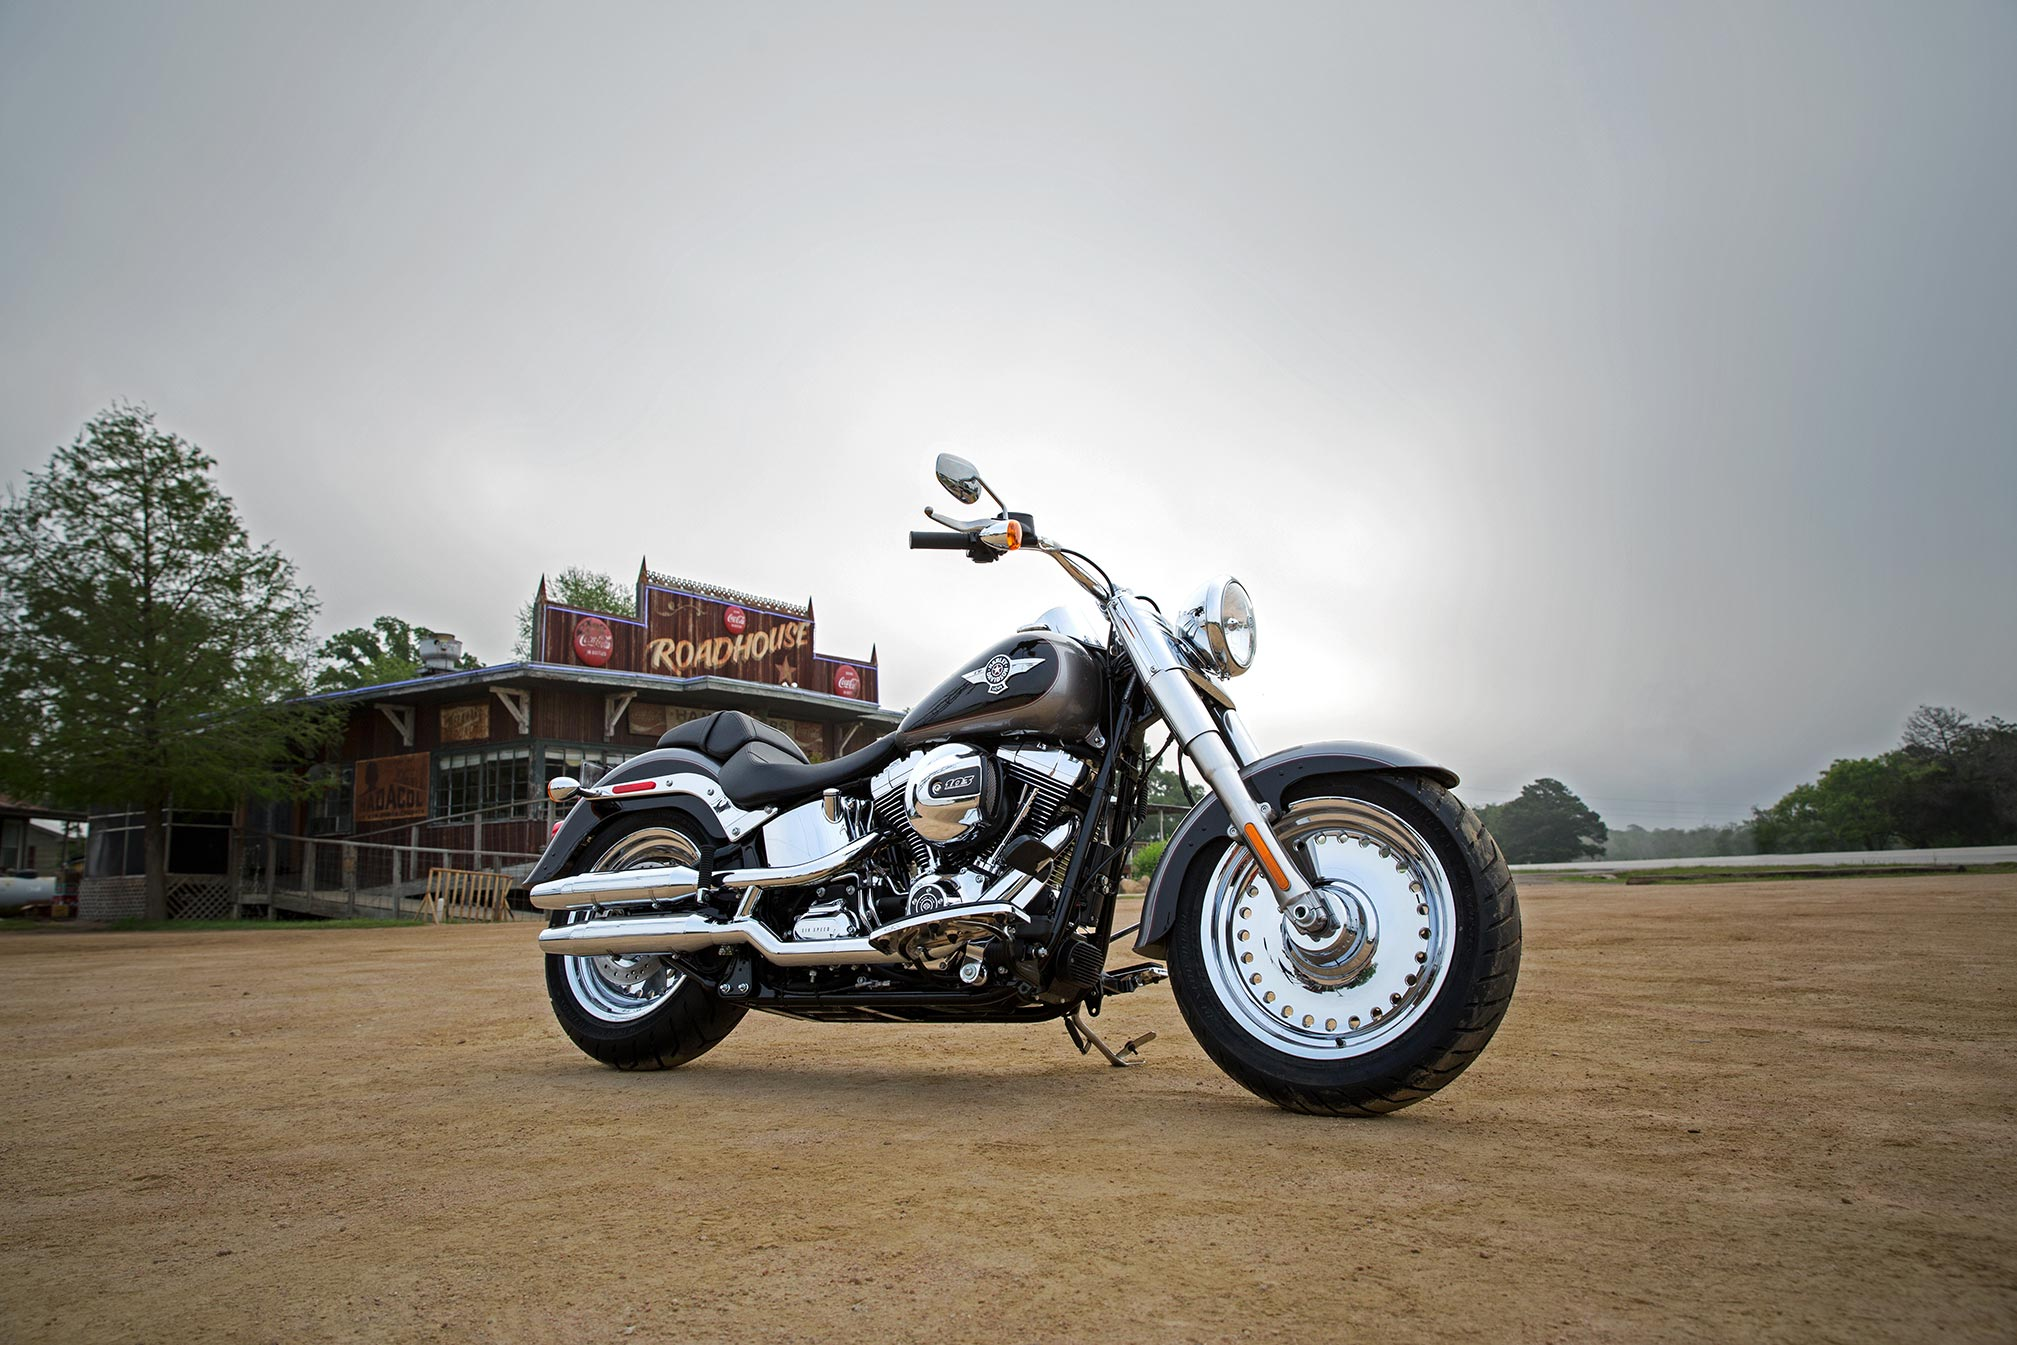 Harley Davidson Fat Boy Wallpaper Resolution 2017x1345 Id 310212 Wallha Com